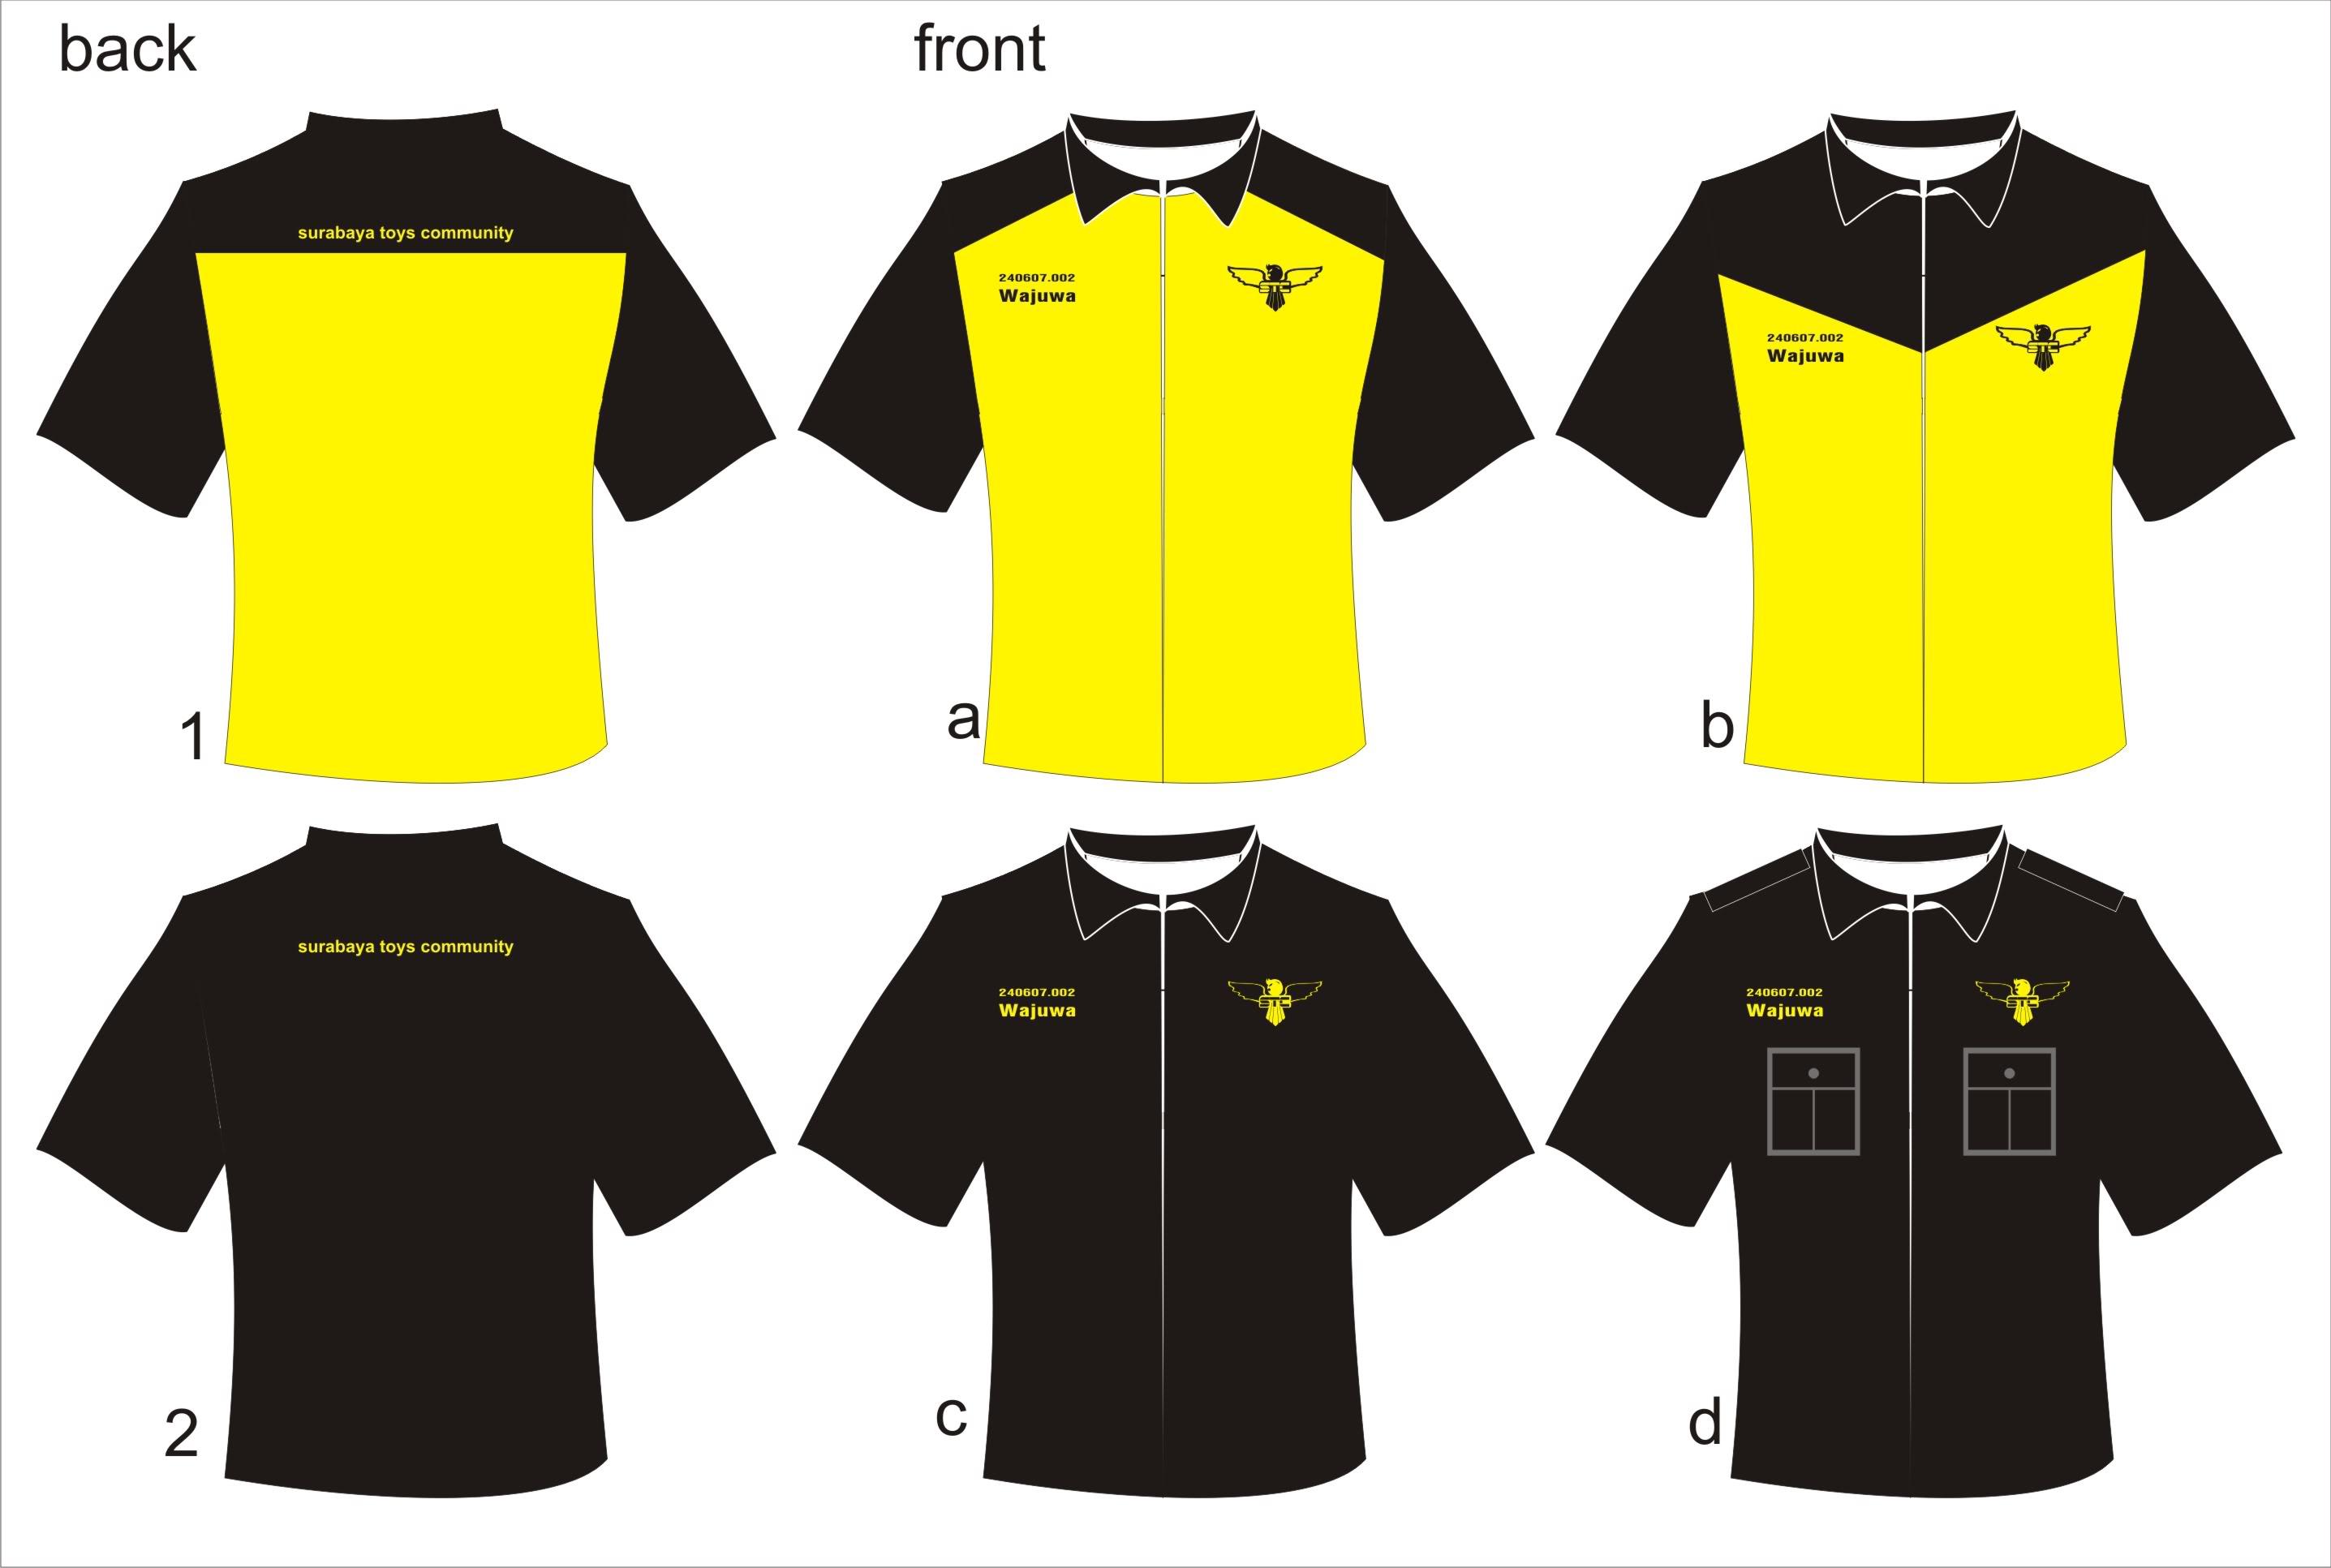 contoh desain kemeja/baju basscom creative